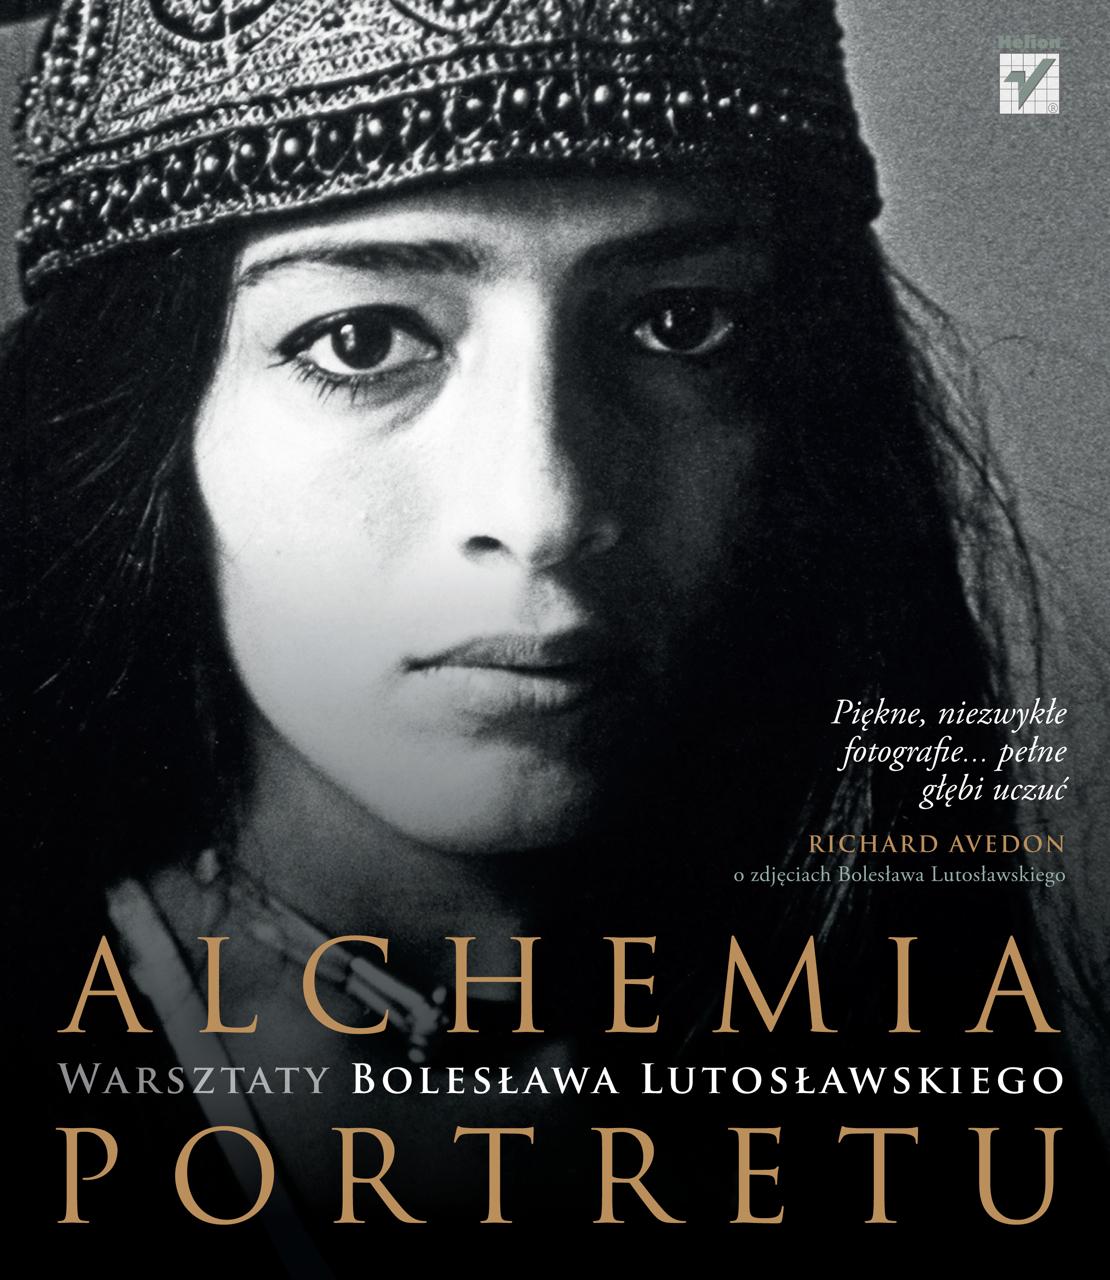 Alchemia Portretu.jpg